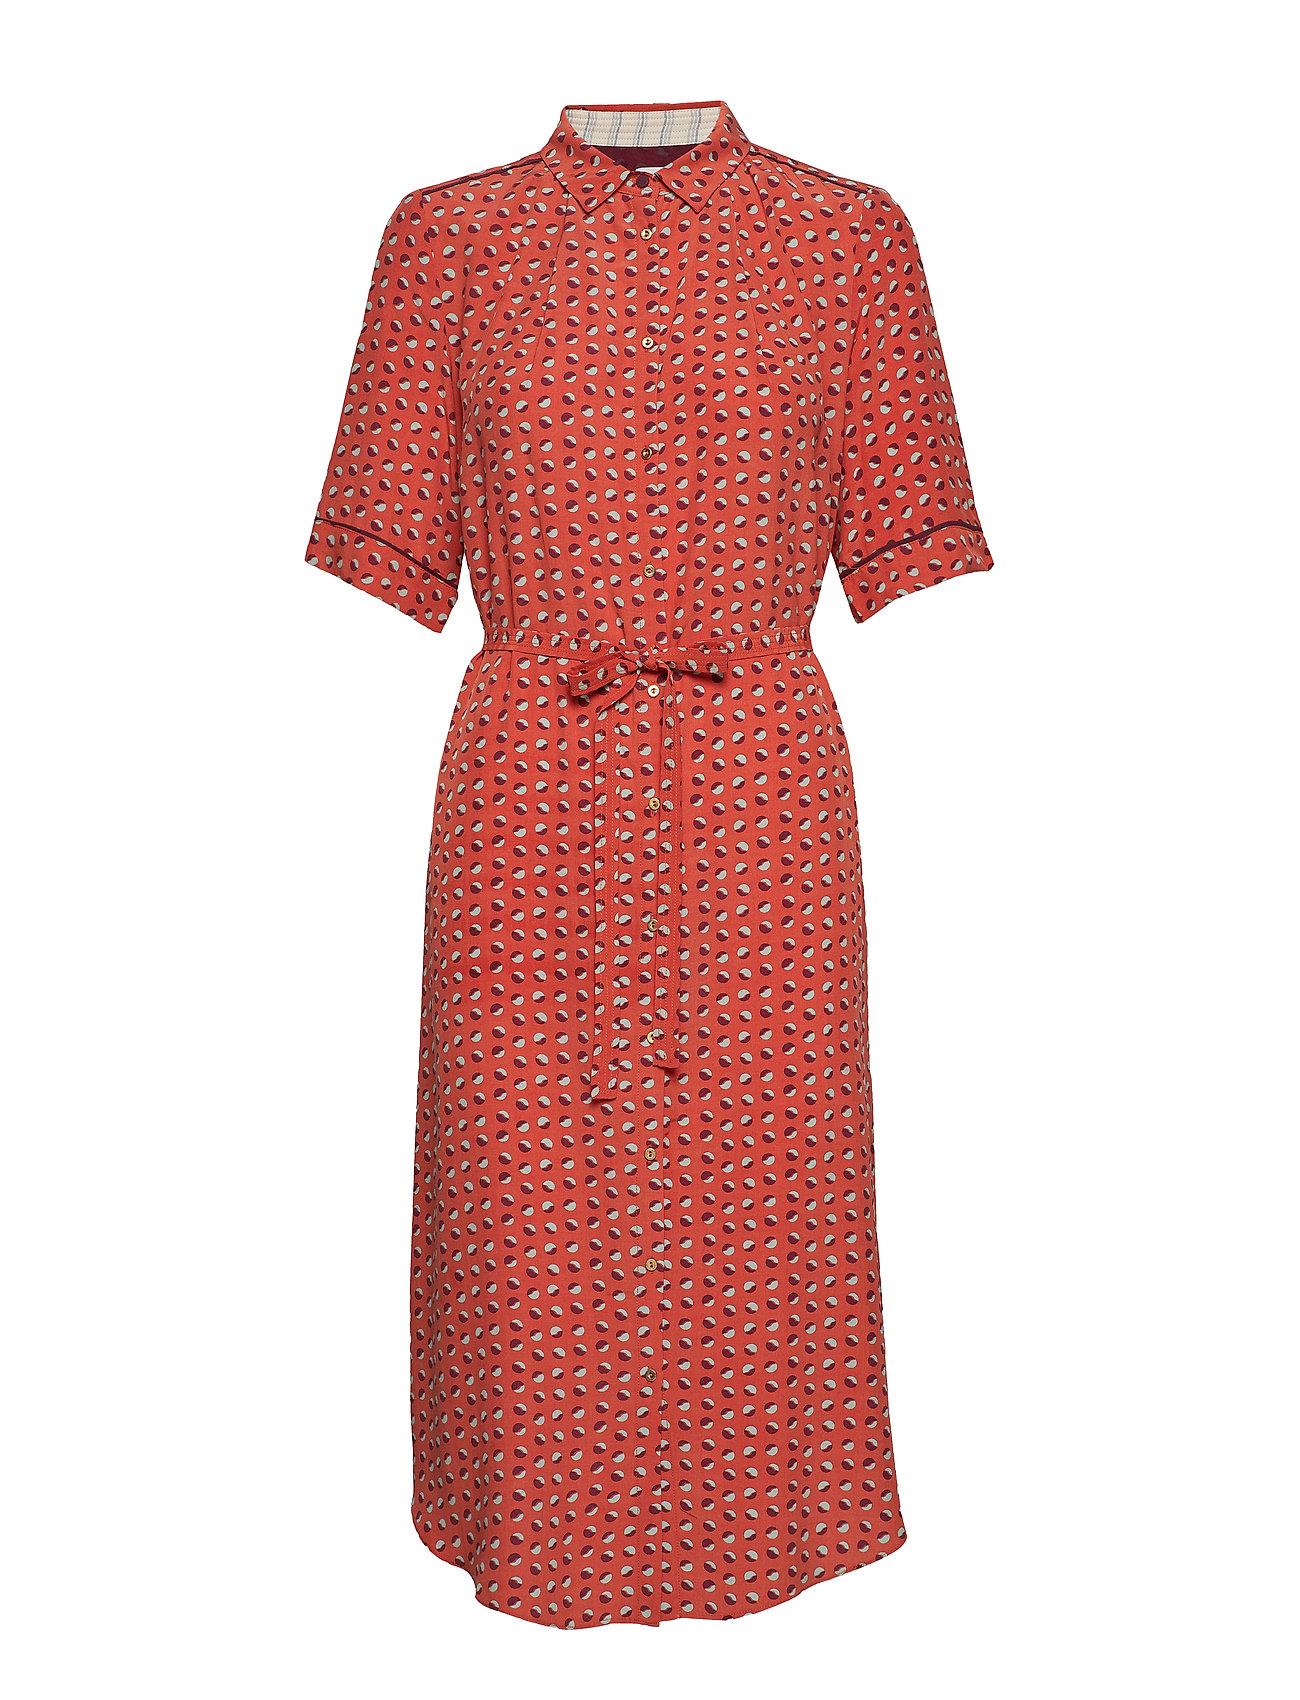 Noa Noa Dress short sleeve - PRINT RED